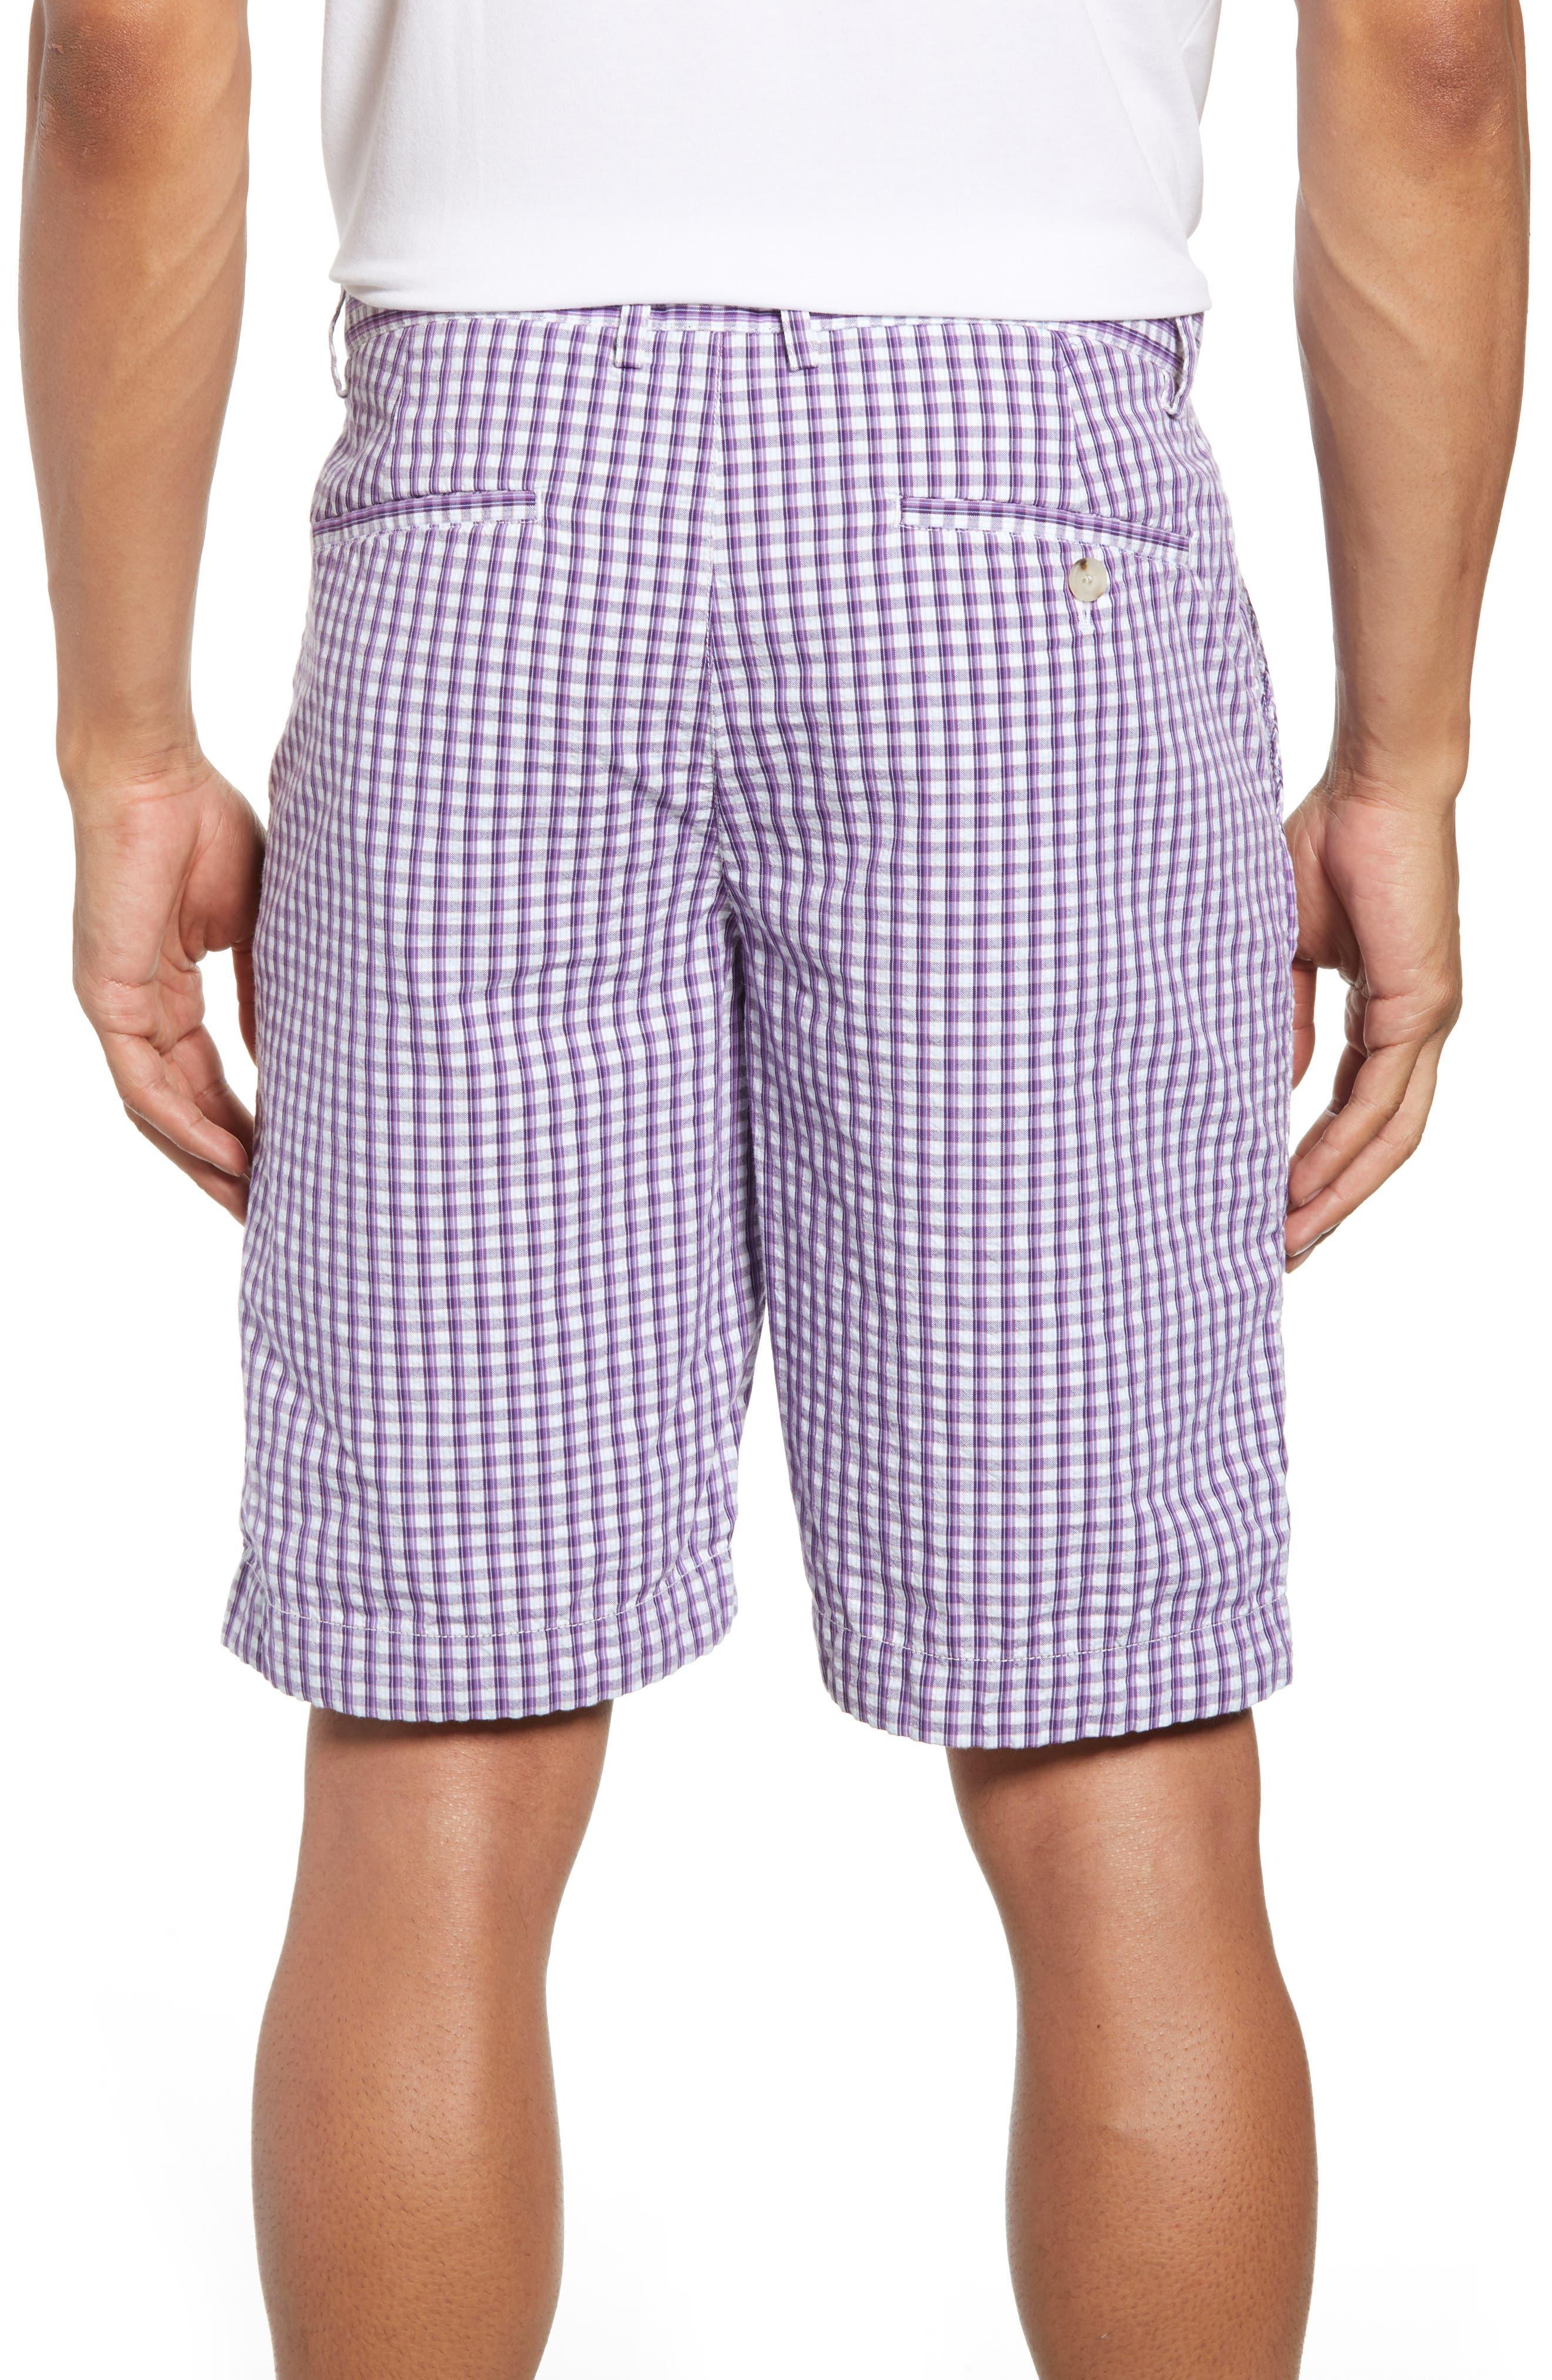 Melendez Classic Fit Shorts,                             Alternate thumbnail 2, color,                             RED